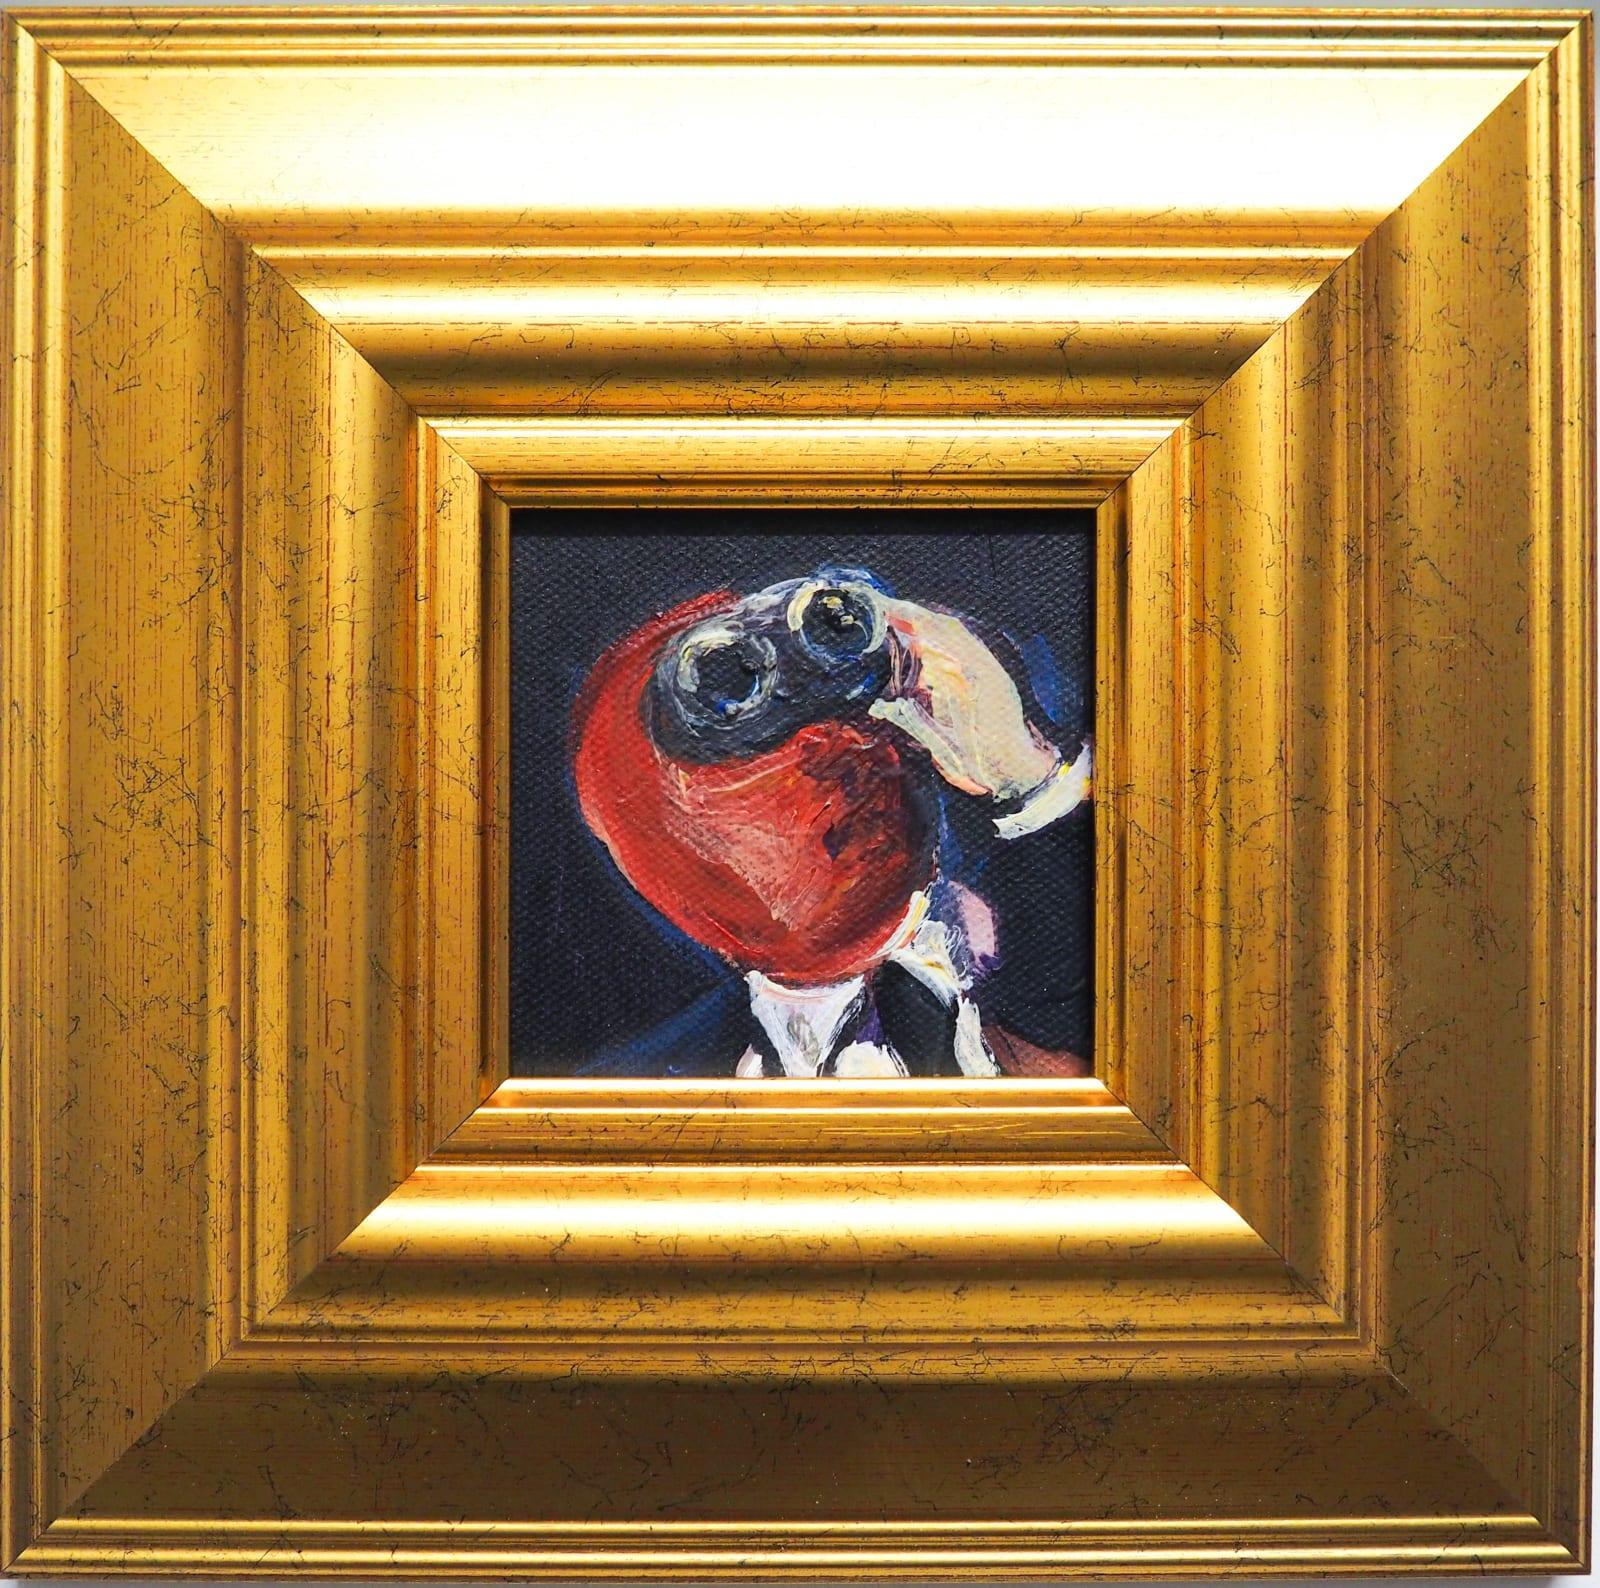 Yassine Balbzioui, jumelles noires, 2018 Oil on canvas 25.5 x 25.2 cm (framed)